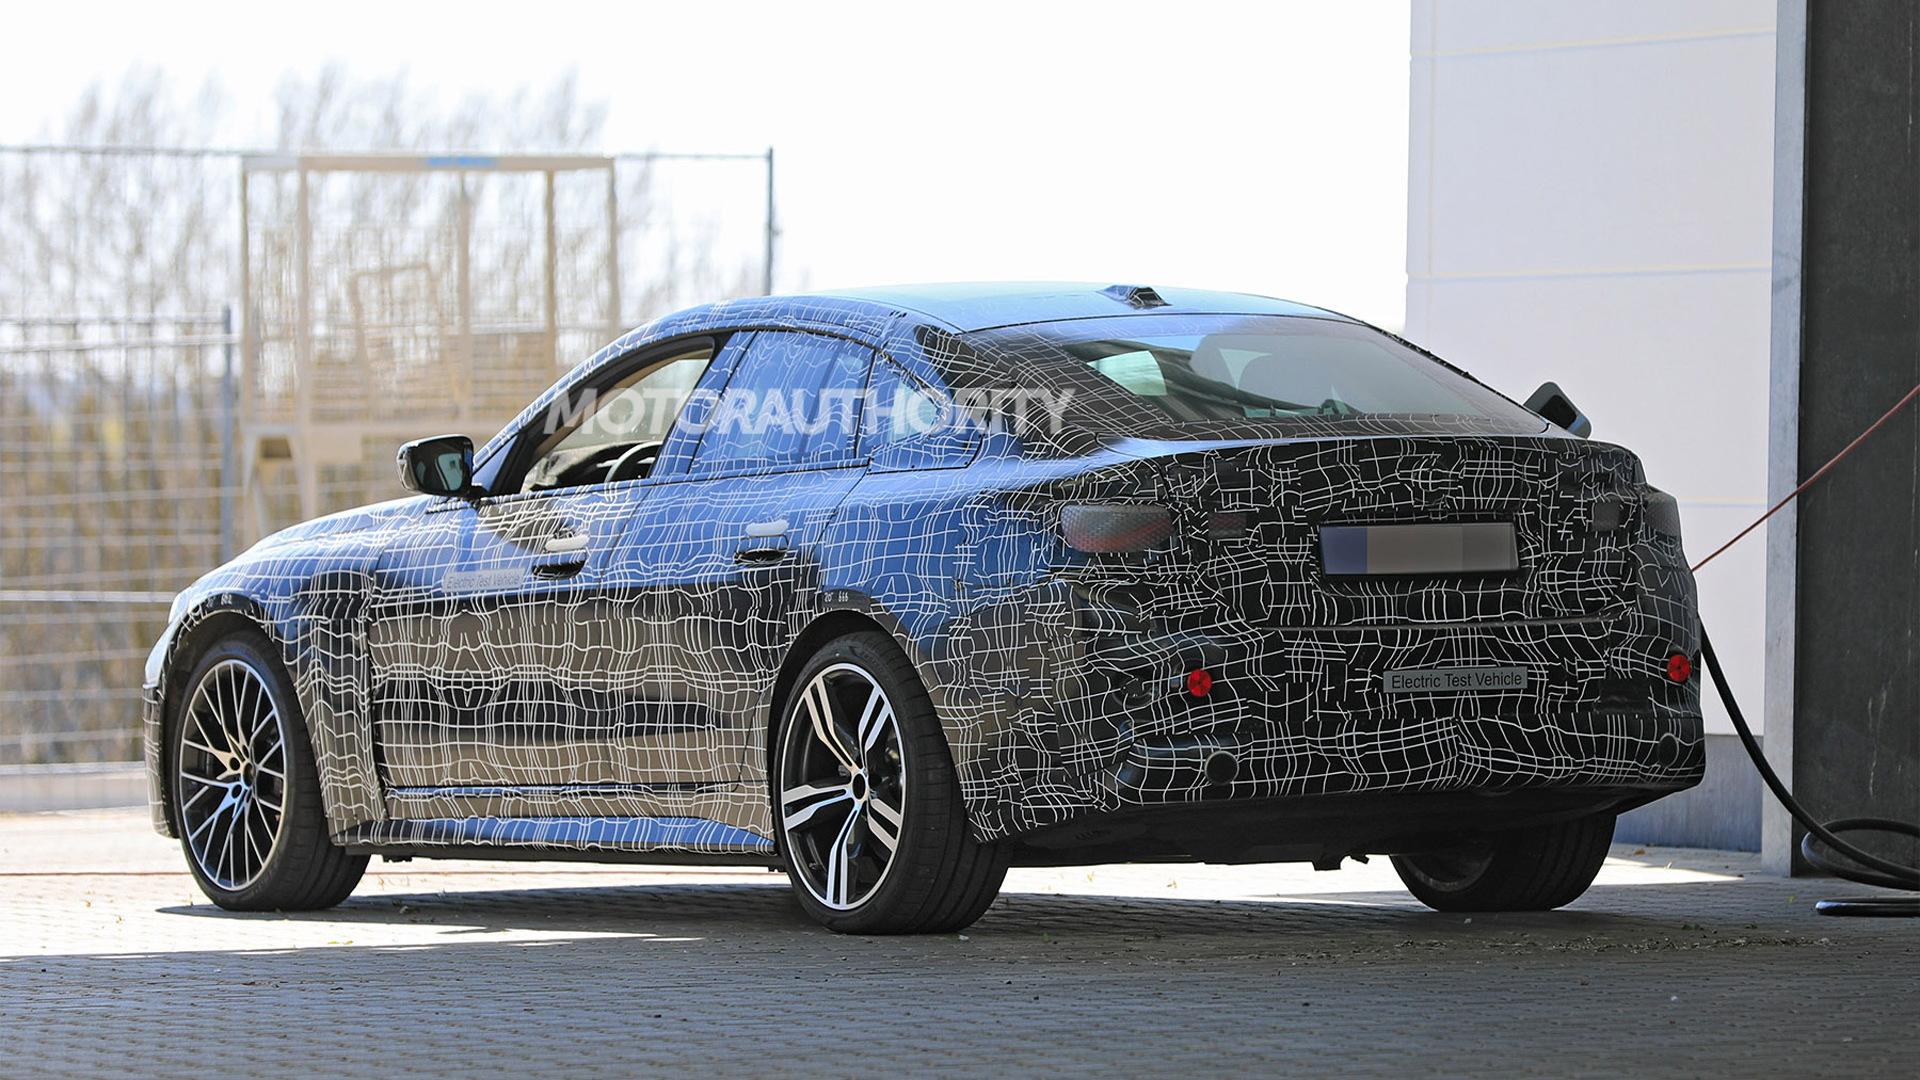 2022 BMW i4 spy shots - Photo credit:S. Baldauf/SB-Medien